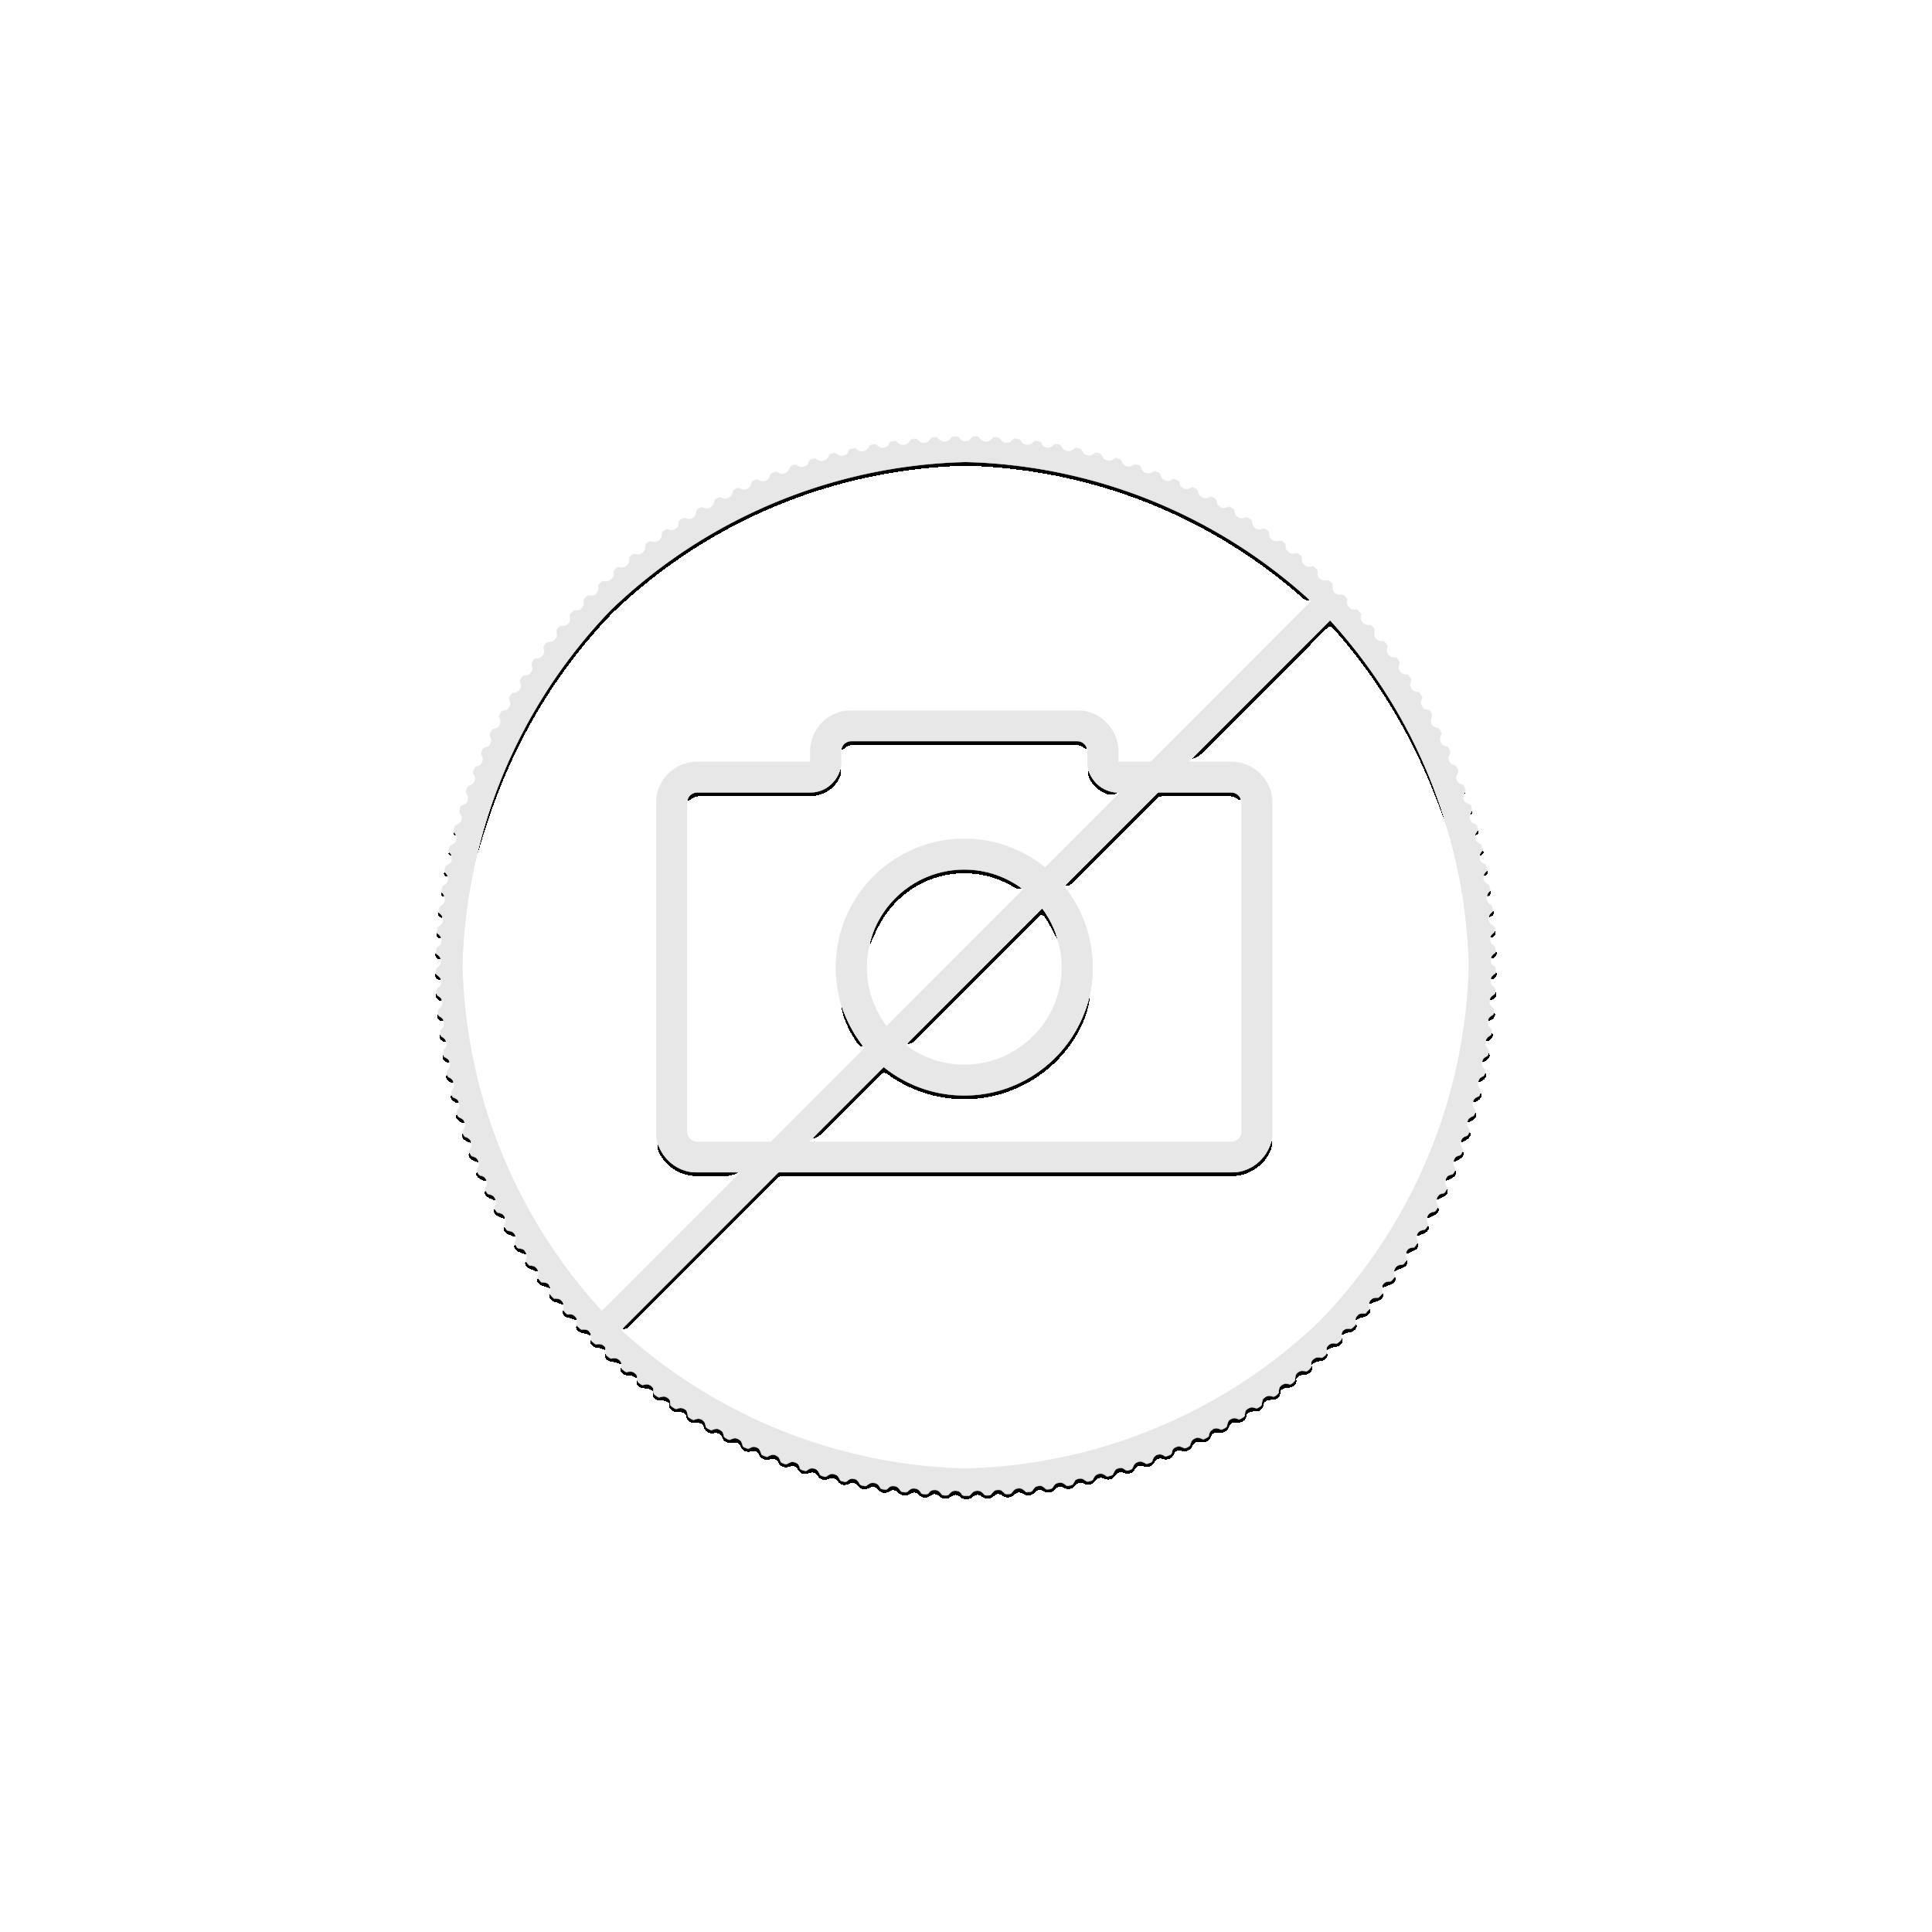 Achterkant Combibar 10 gram (10 x 1 gram goudbaar)